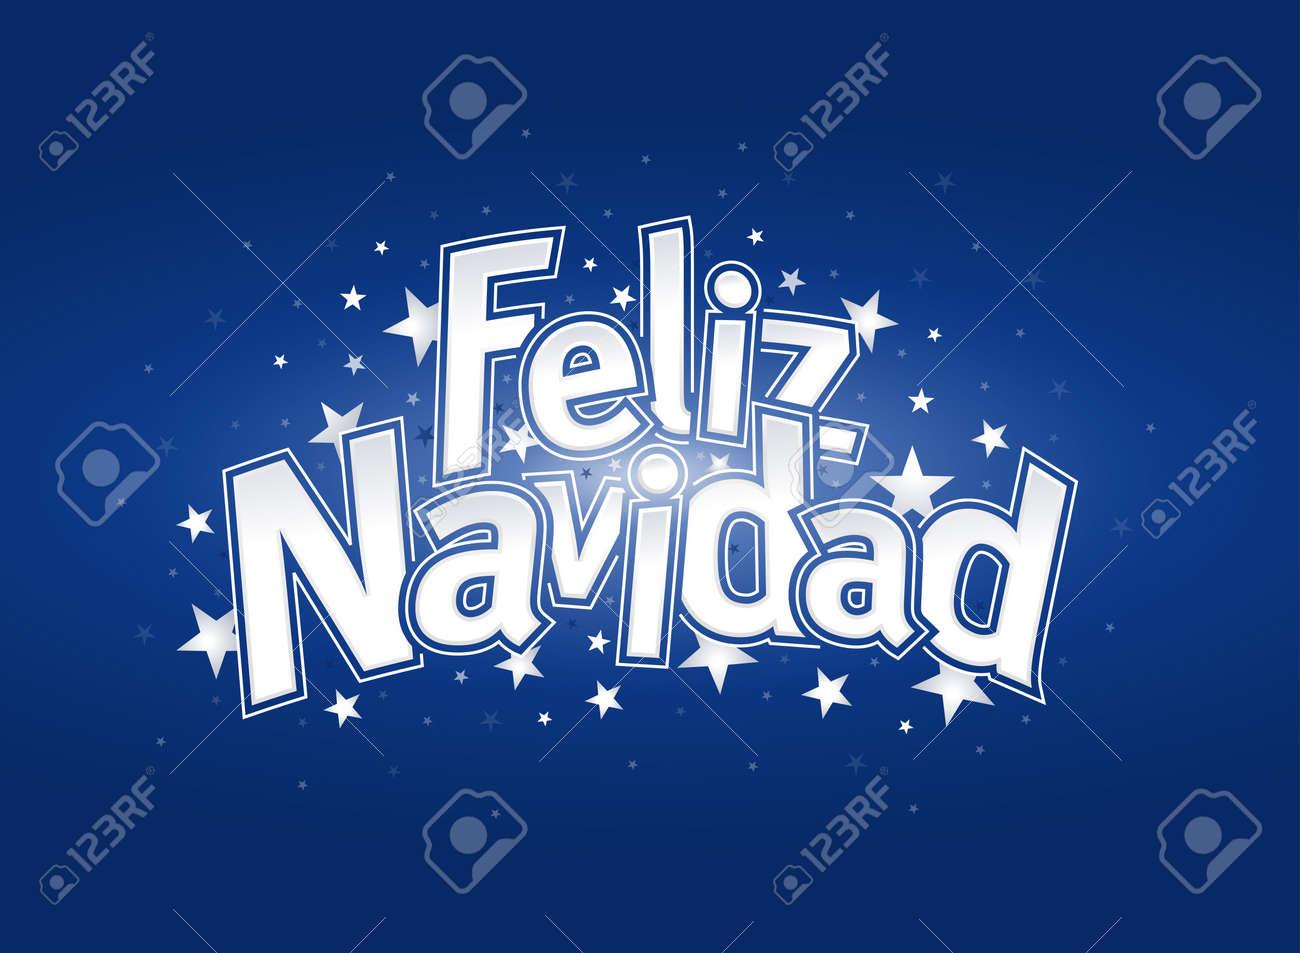 Feliz navidad merry christmas in spanish language blue cover feliz navidad merry christmas in spanish language blue cover of greeting card with stars kristyandbryce Images